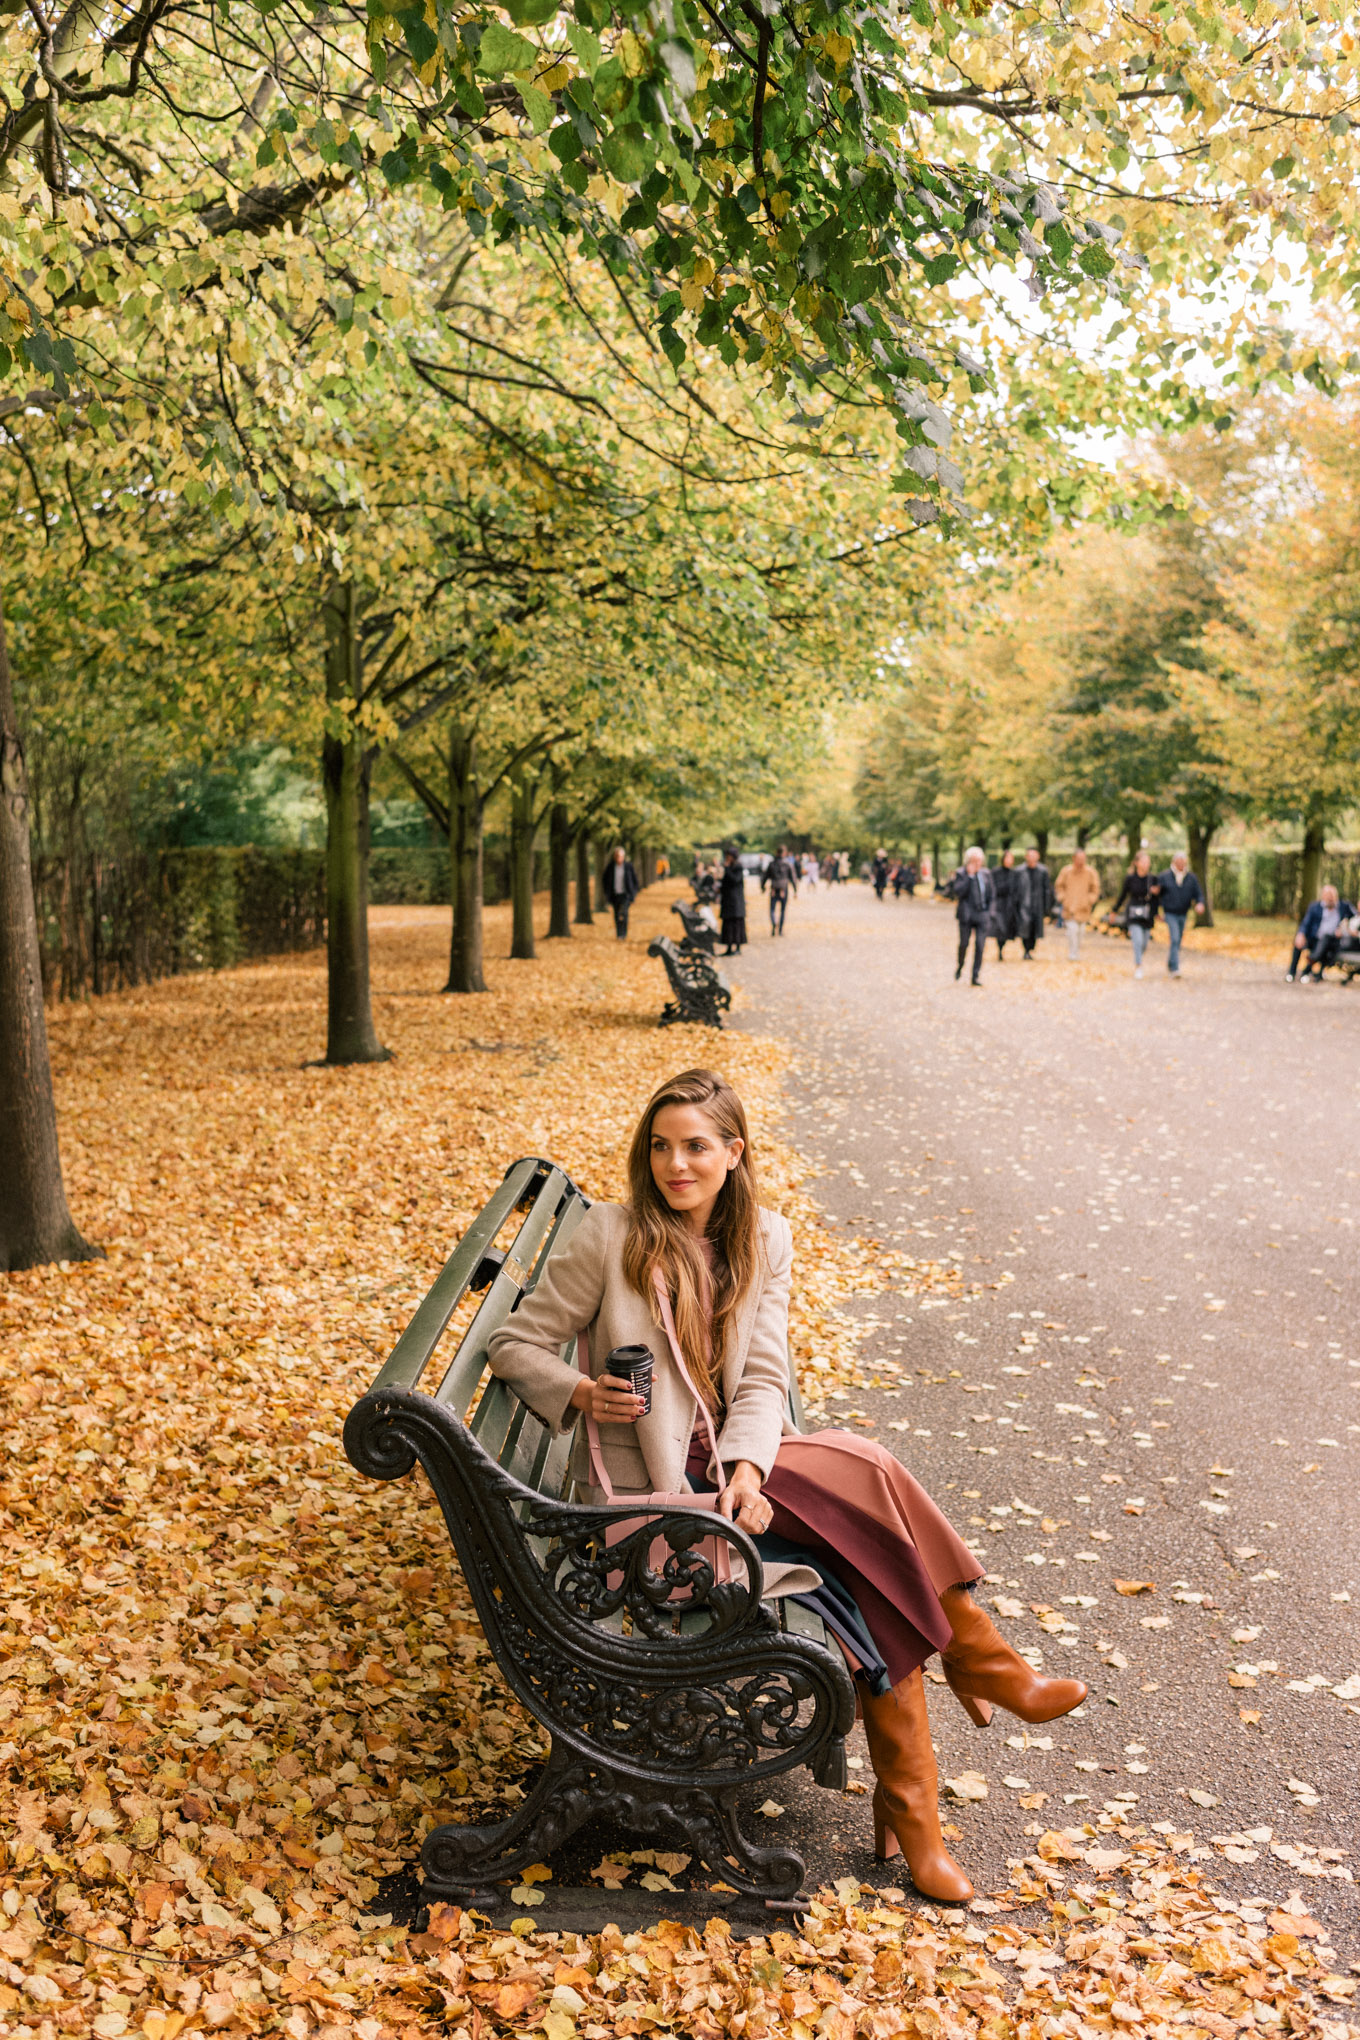 gmg-london-fall-october-1001833